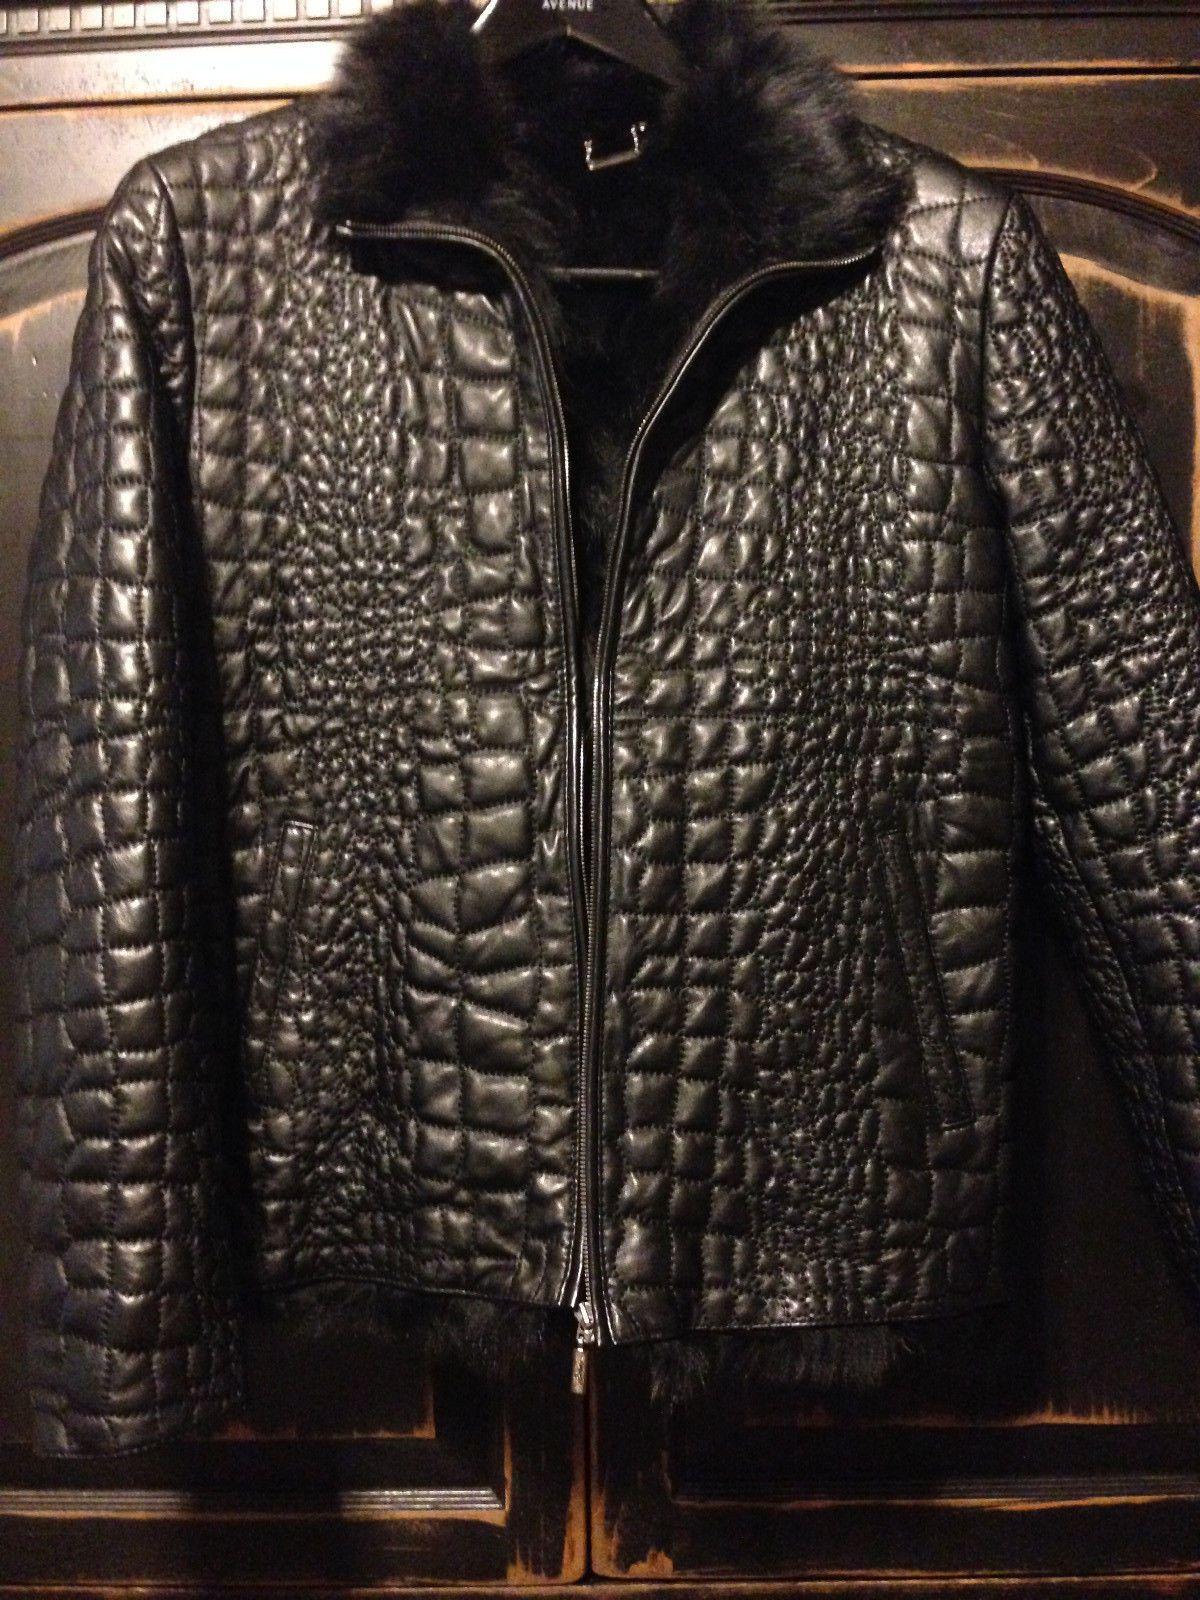 bc306dacbd NWT  12995 Brioni Crocodile Stitched Leather With FUR Lining XL 54 44 42  NEW